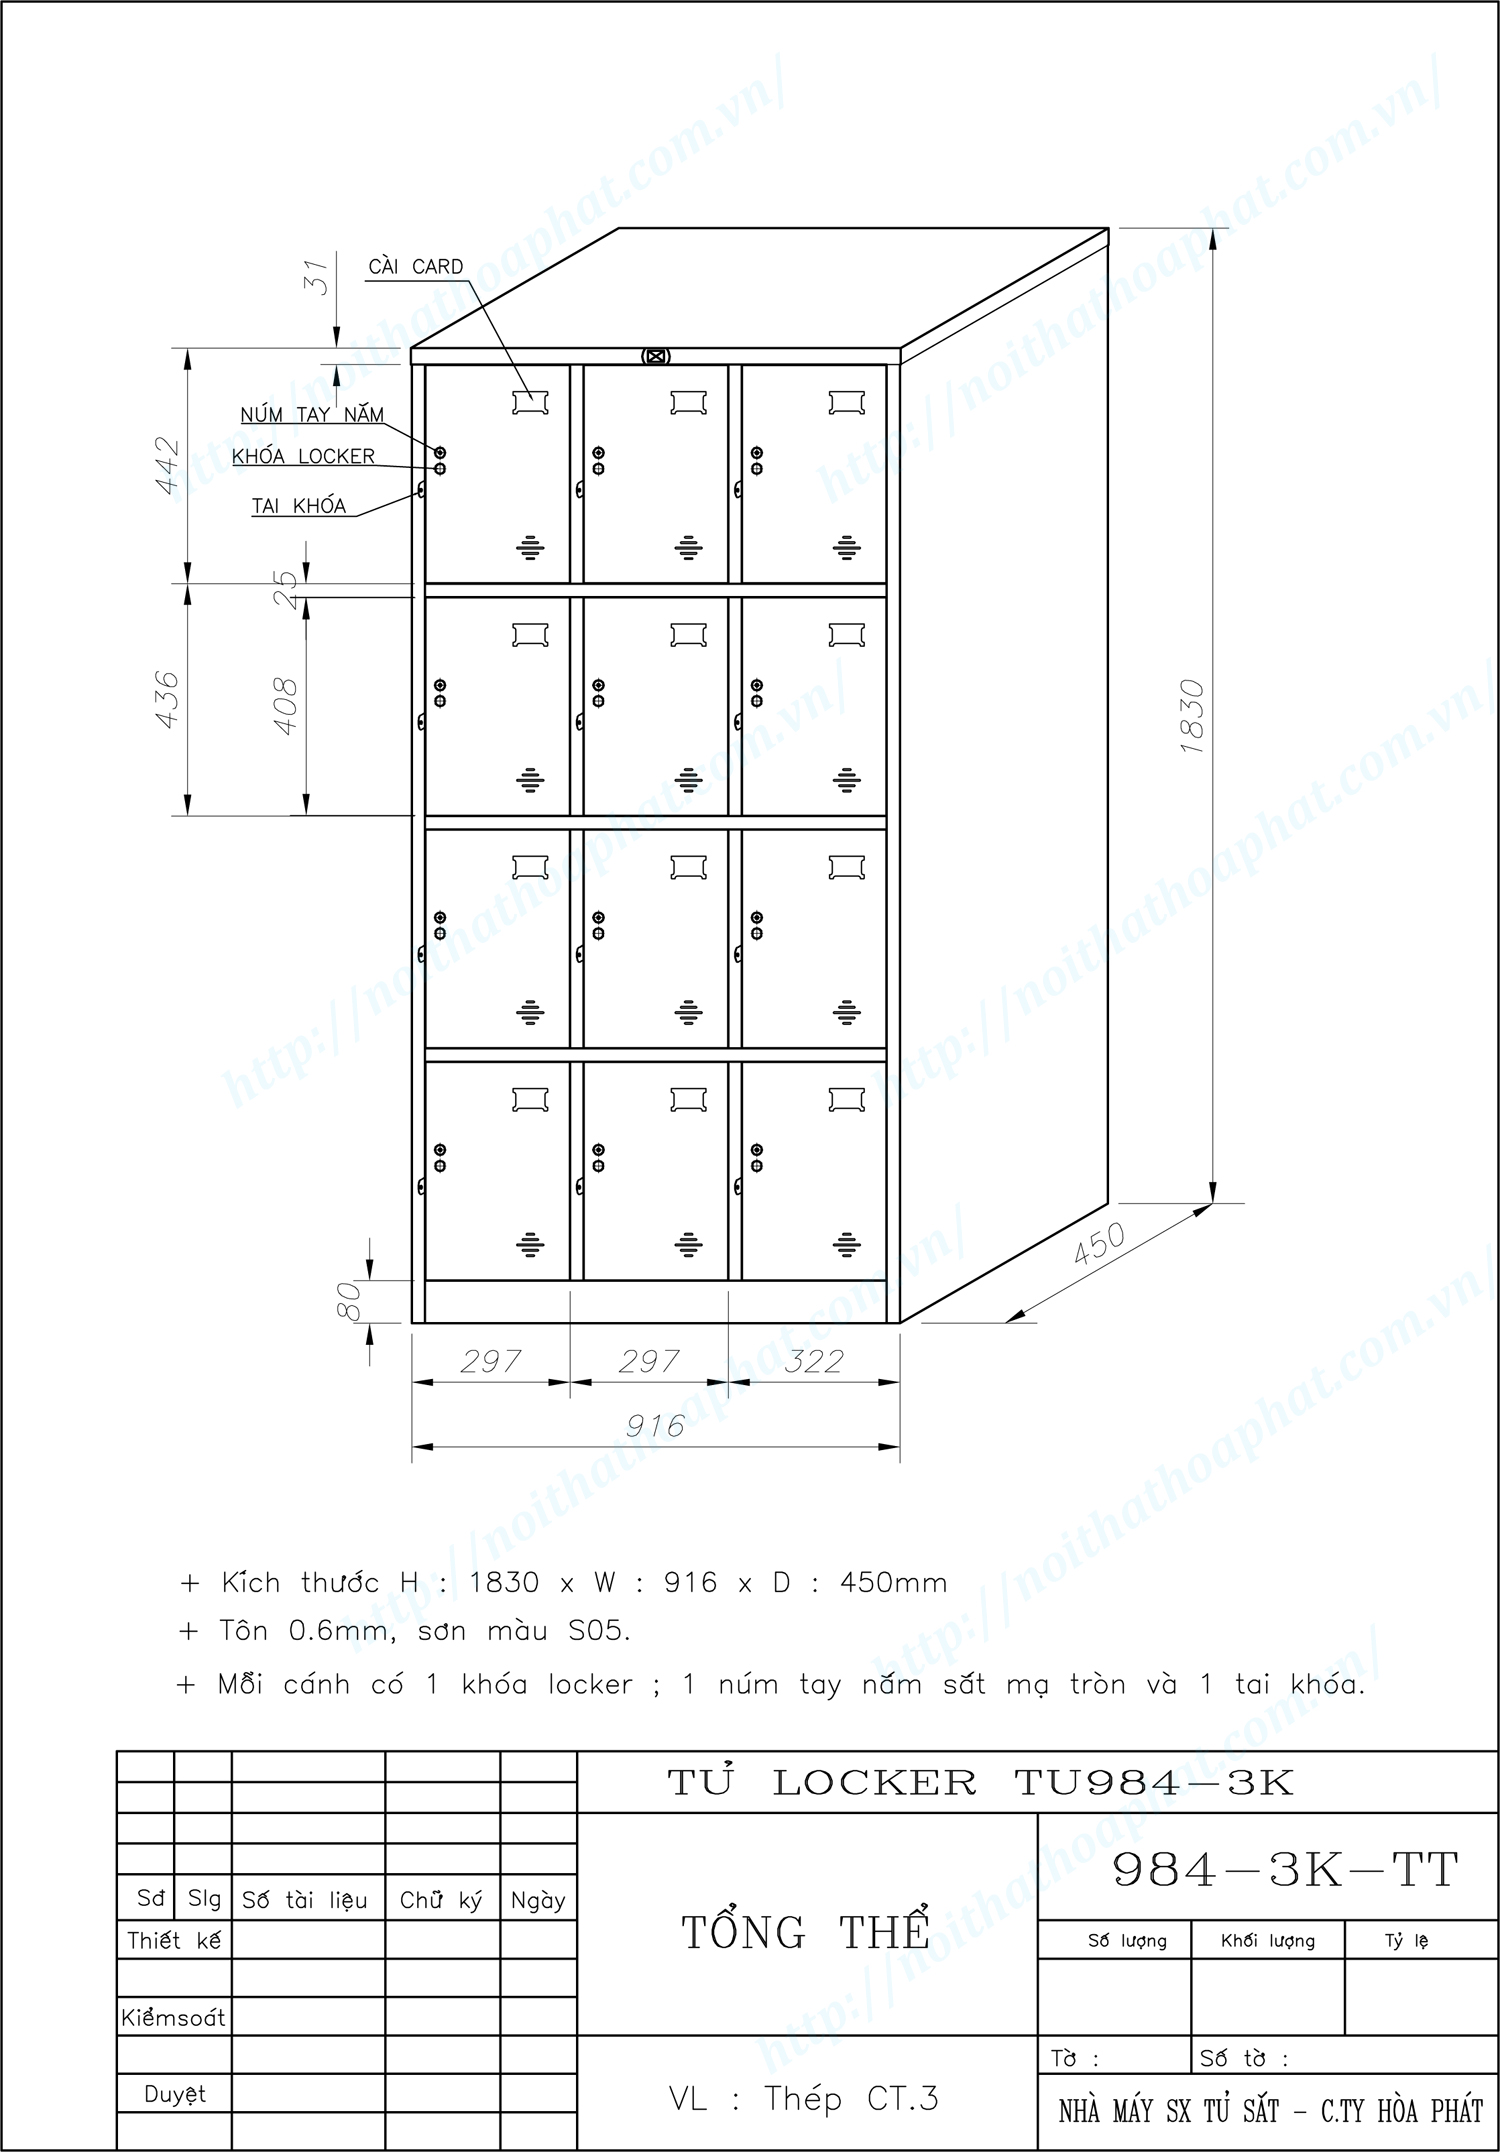 Bản vẽ kỹ thuật tủ locker 12 ngăn TU984-3K